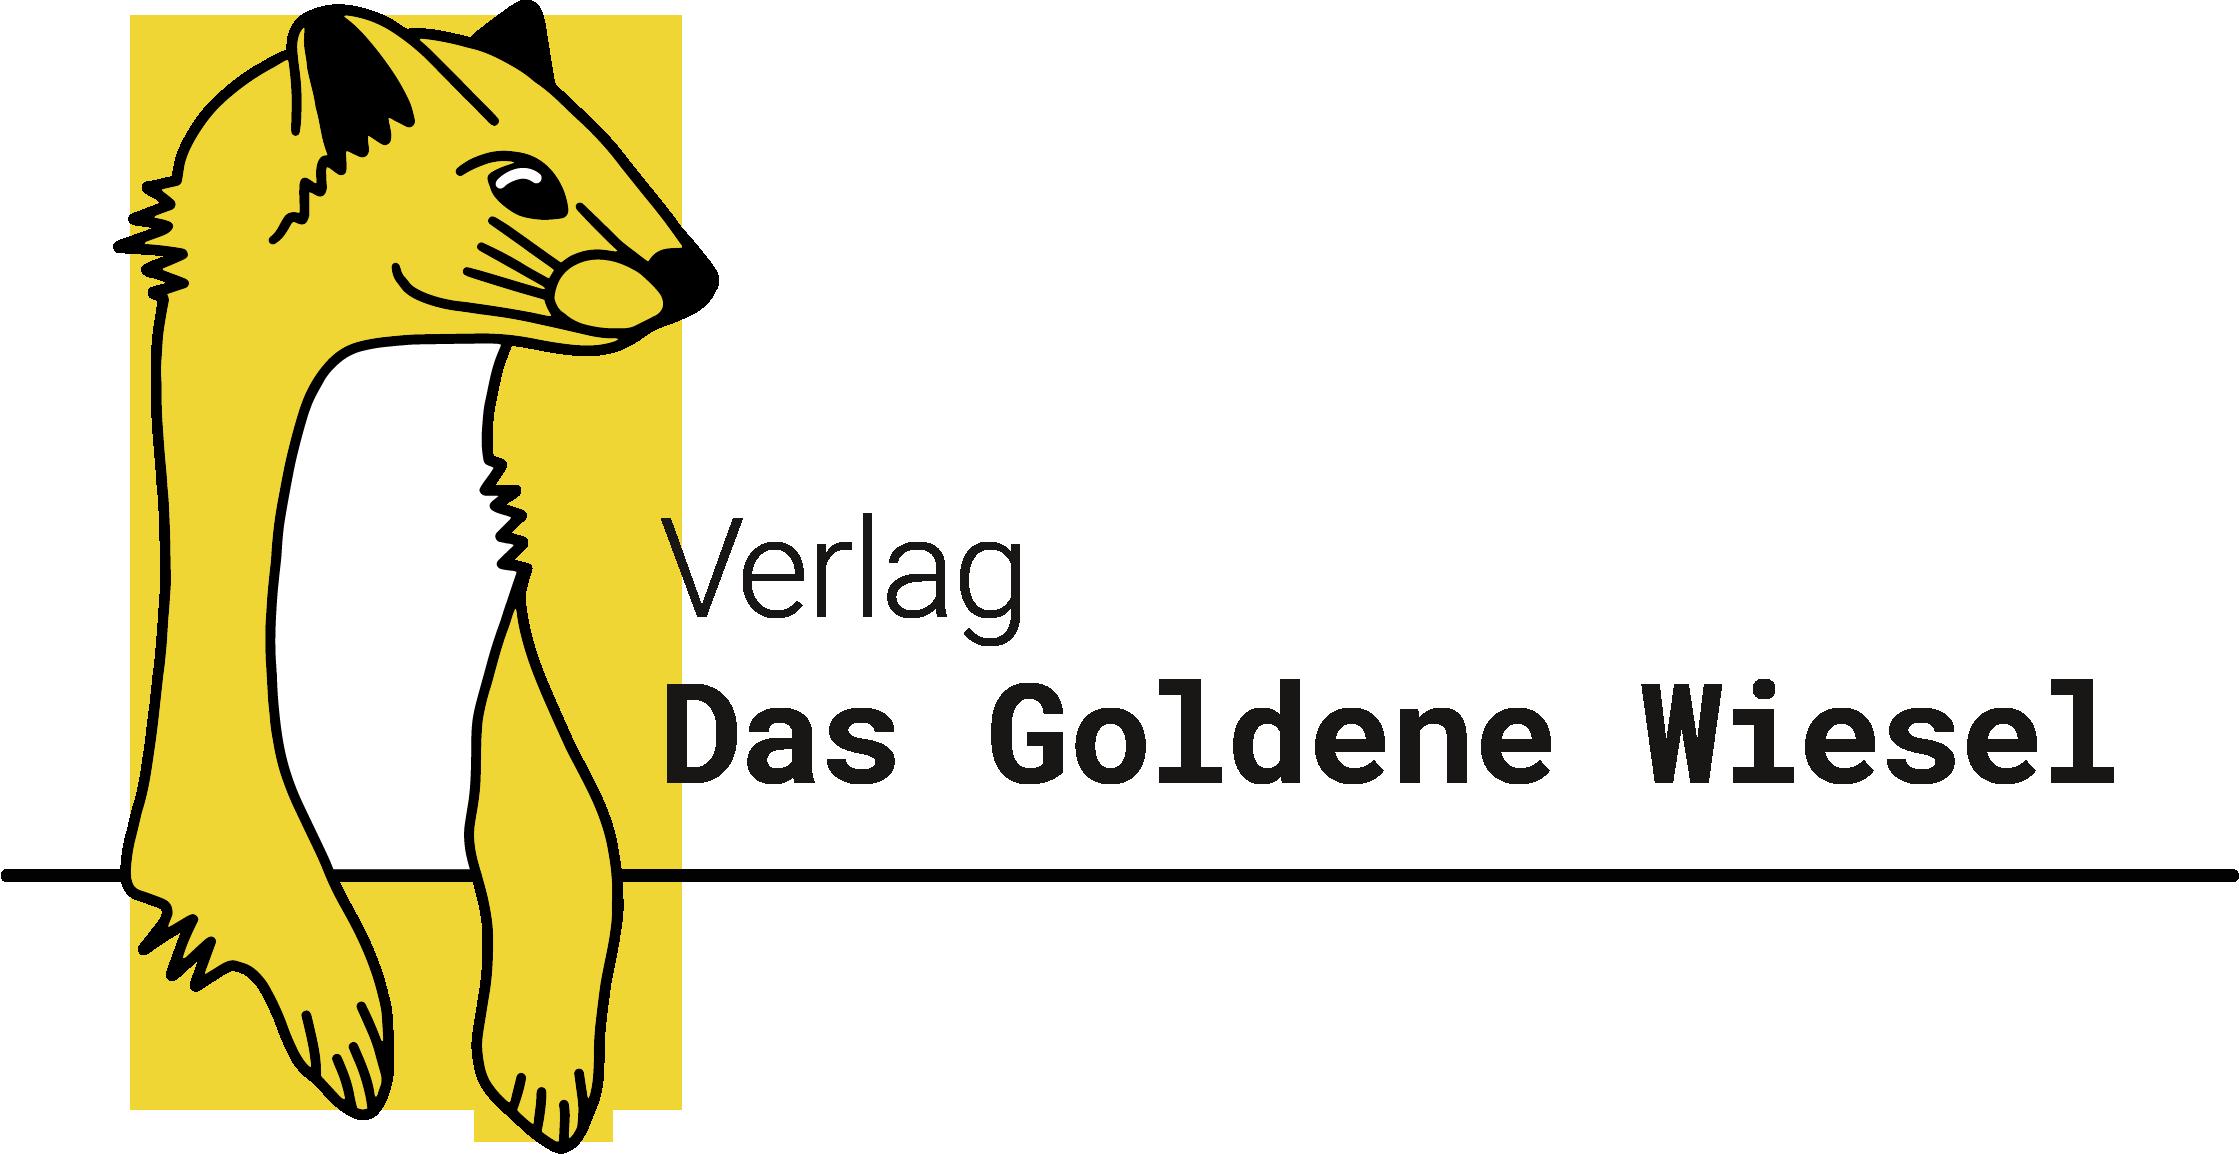 Verlagslogo das goldene Wiesel